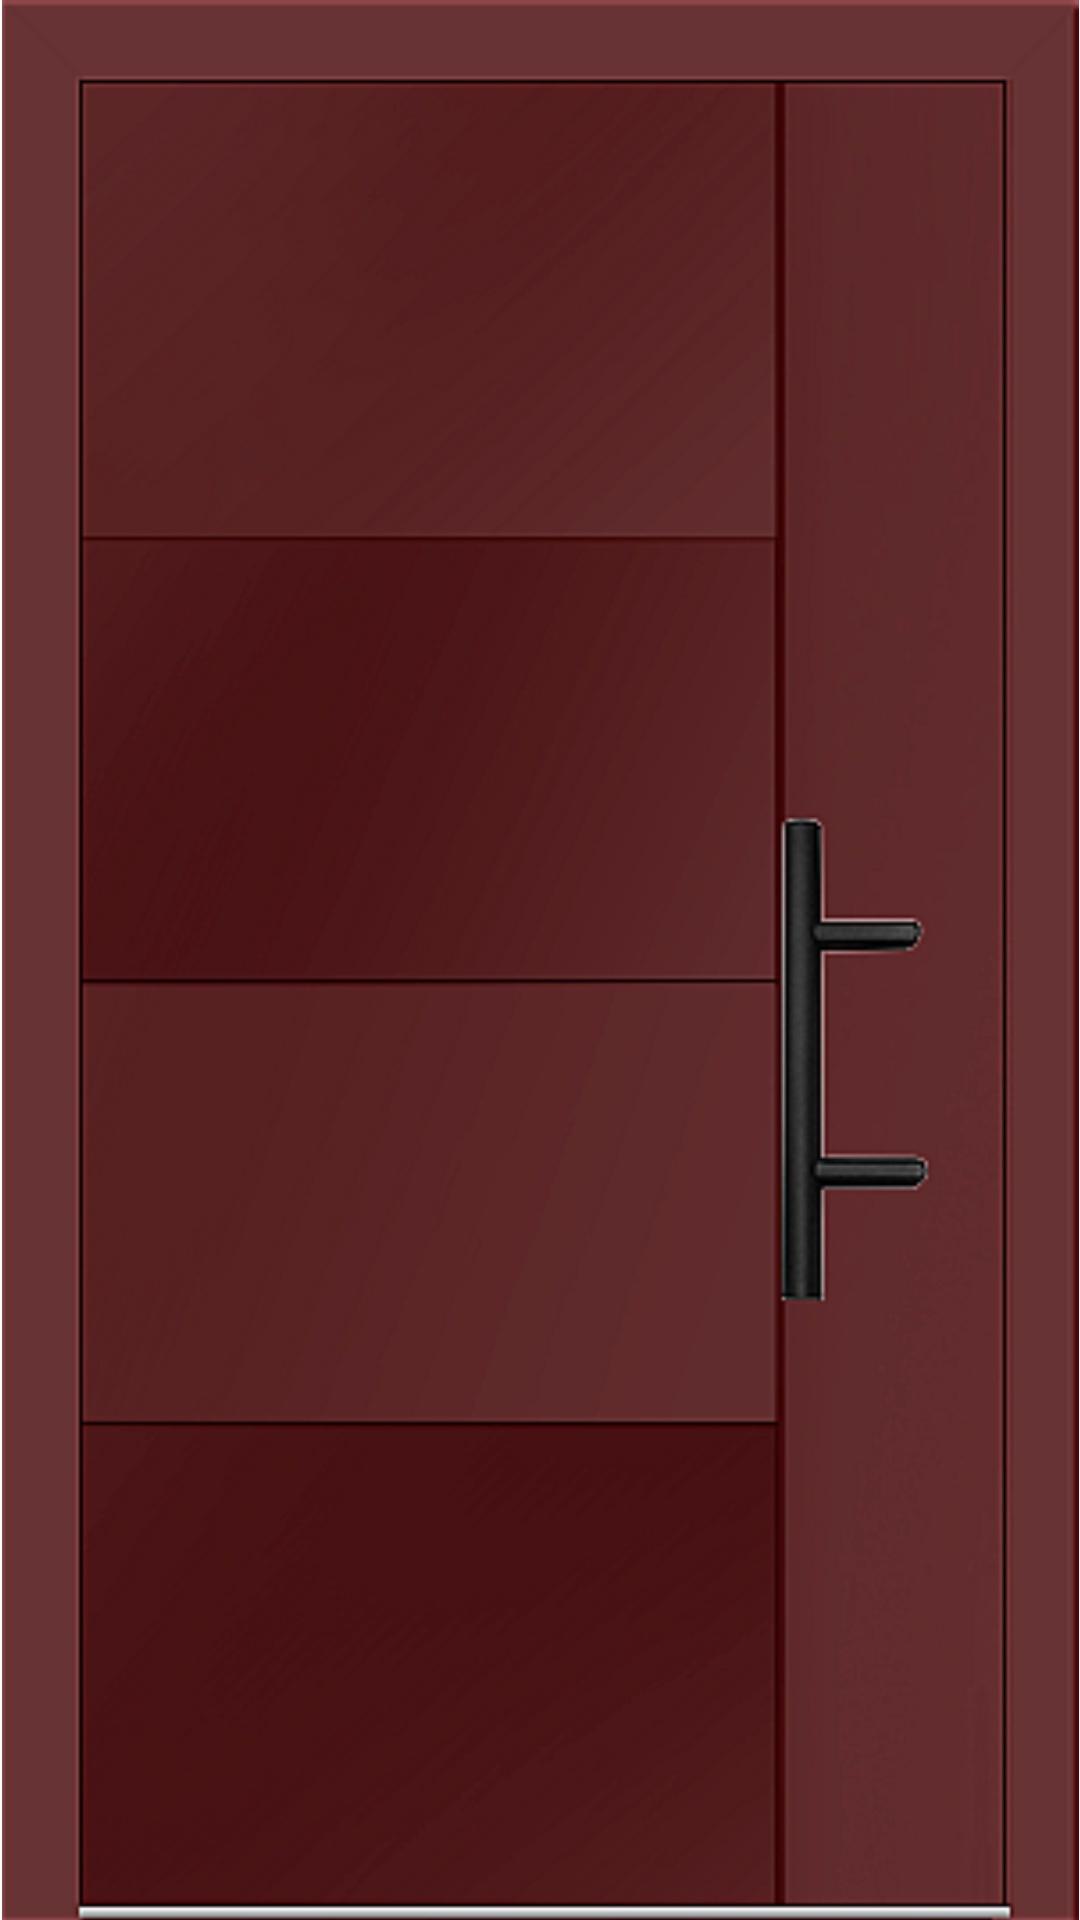 Holz-Alu Haustür Modell 66874 braunrot